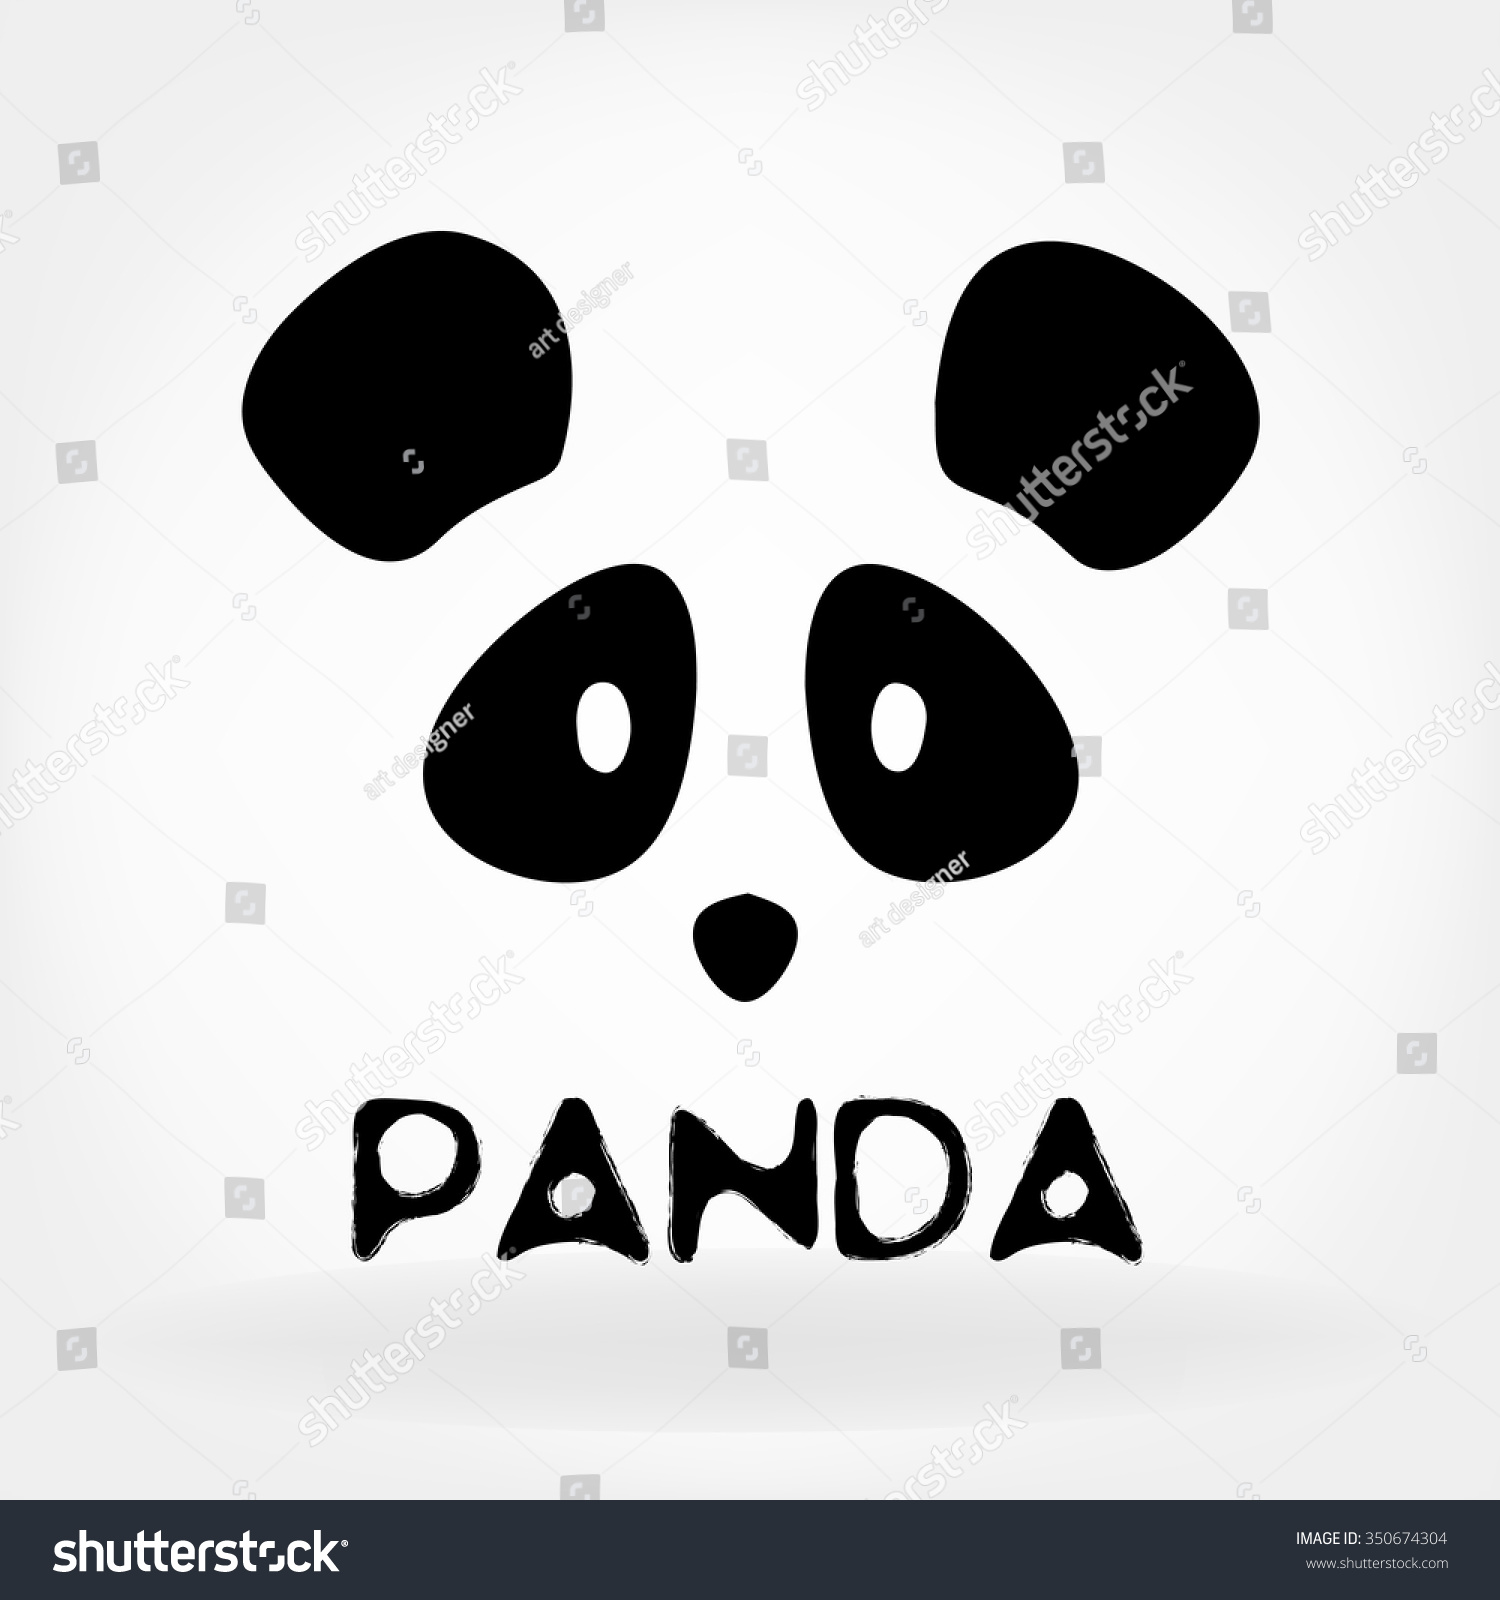 Panda Logo Design Template Stock Vector 350674304 - Shutterstock